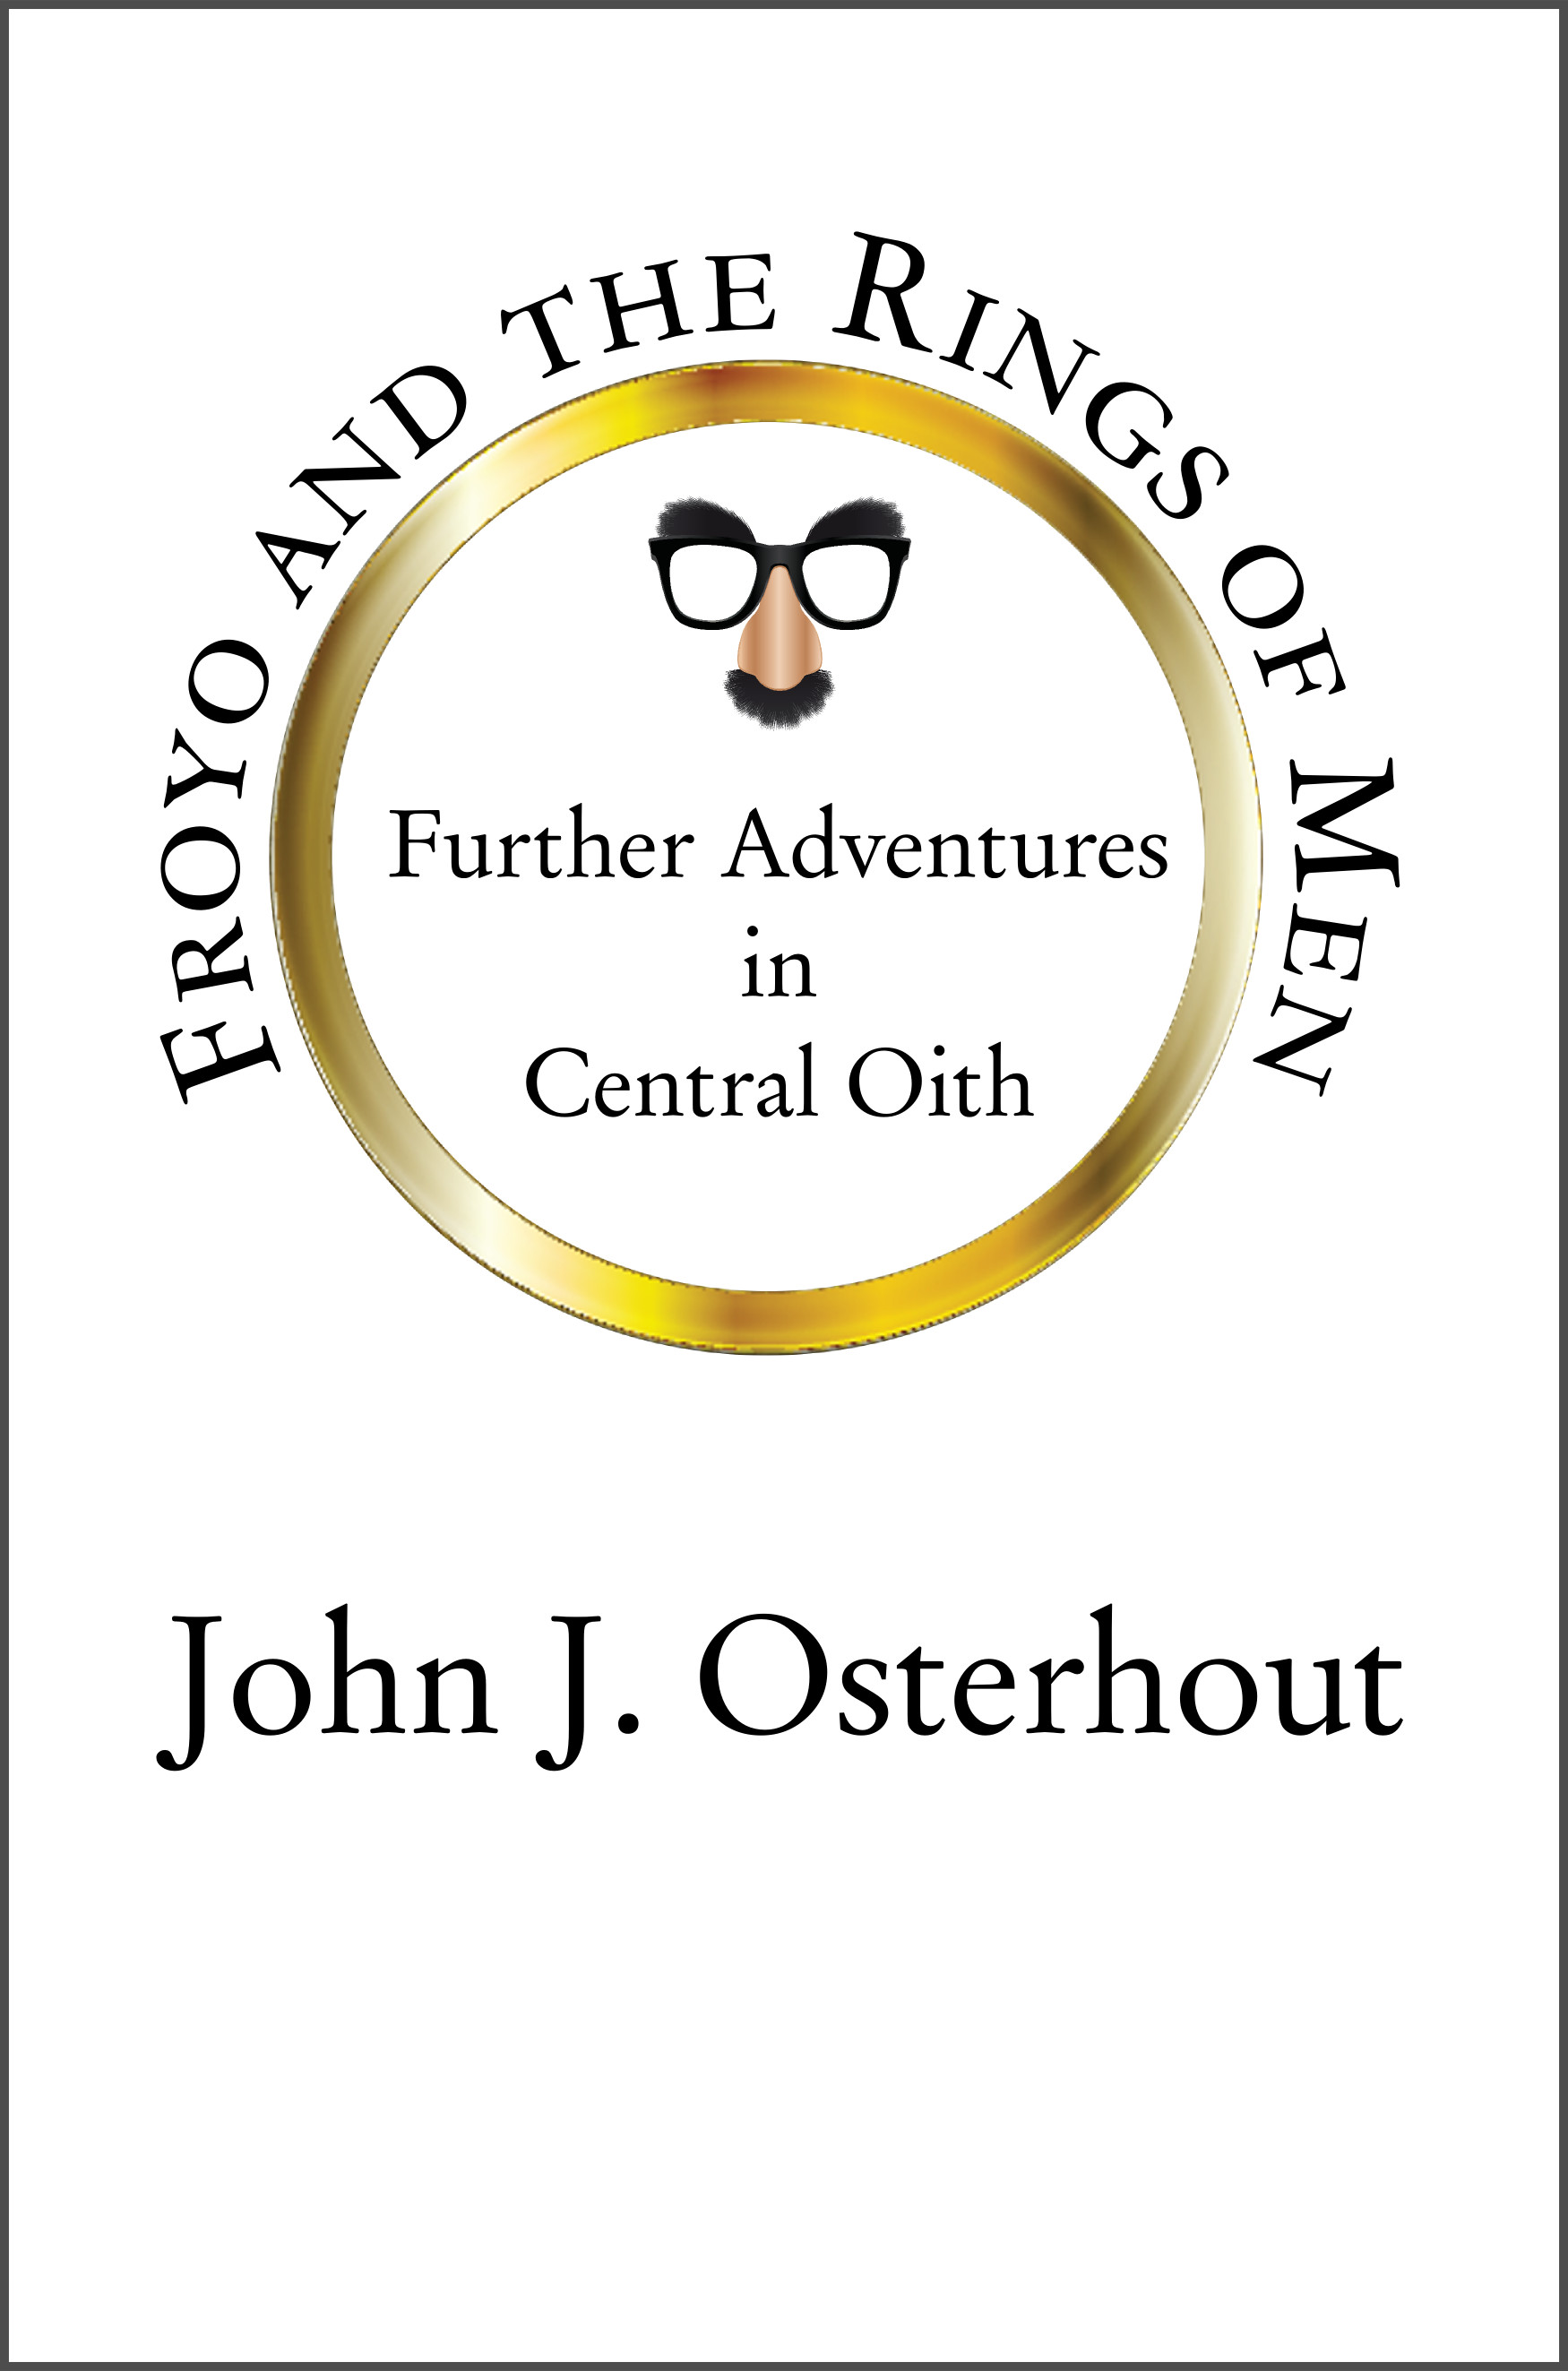 Books john osterhout froyoandtheringsofmencover fandeluxe Choice Image